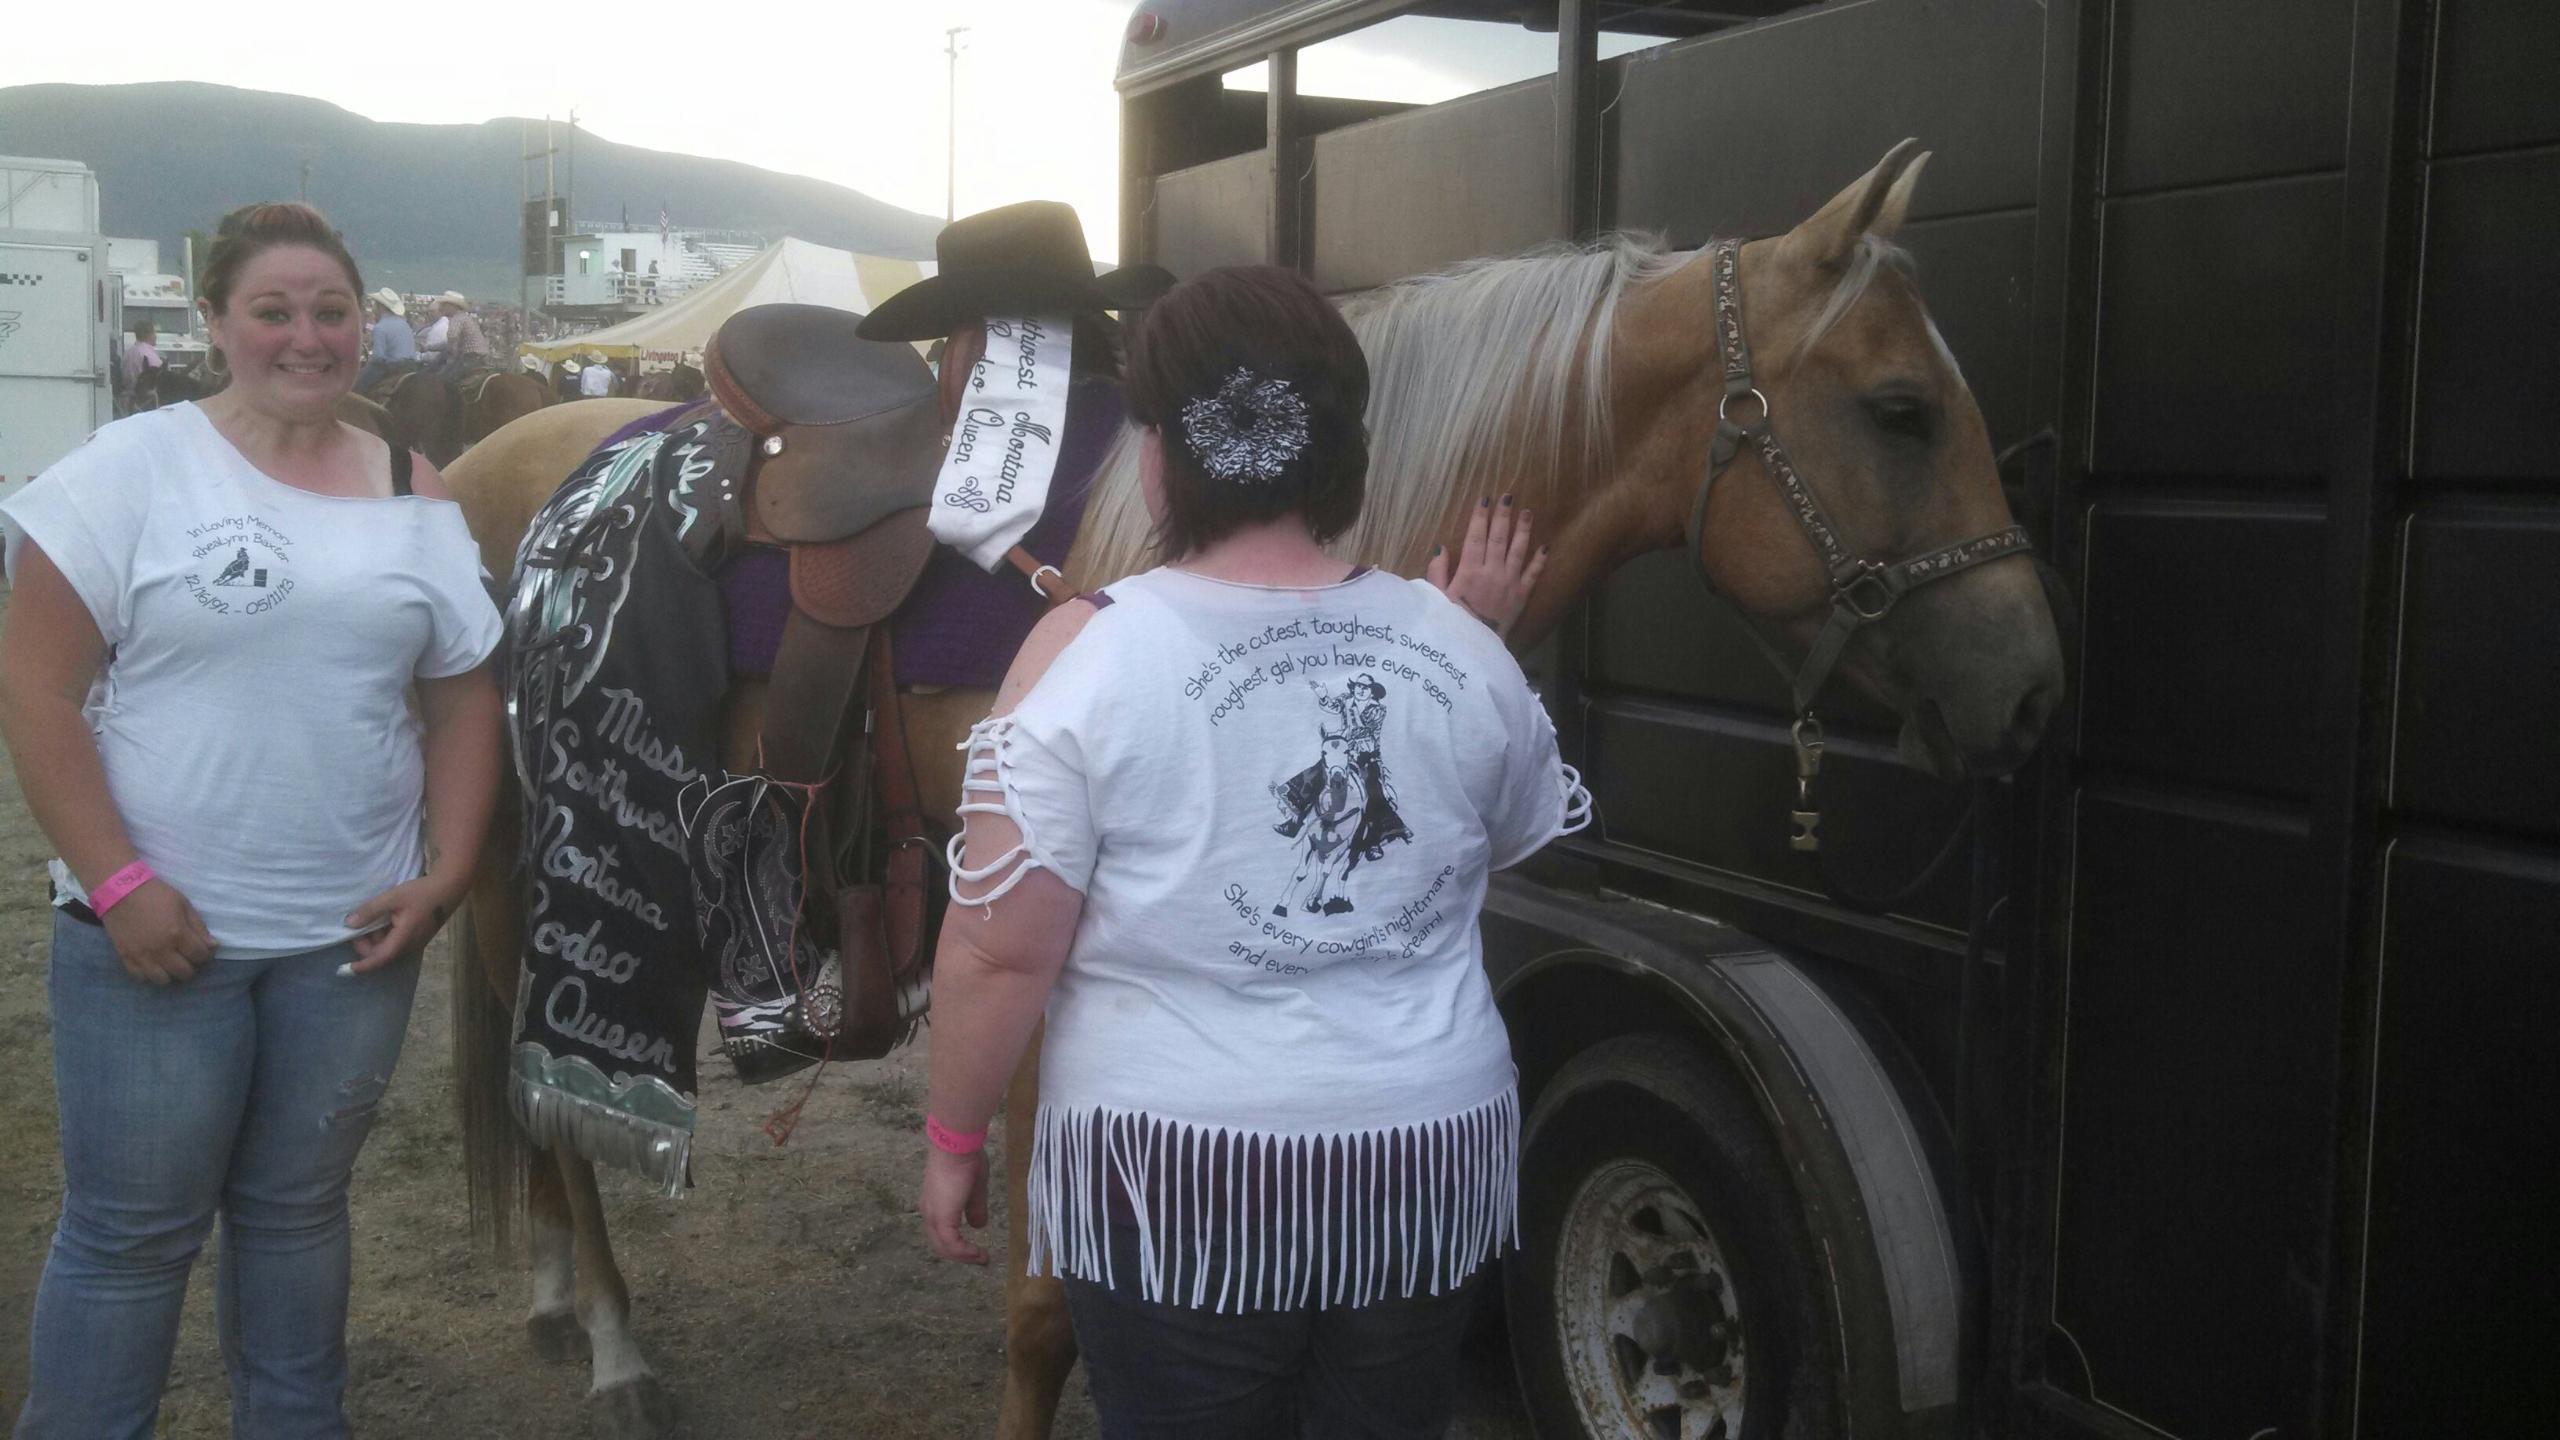 Custom T Shirts For Rest In Peace Rhea Lynn Shirt Design